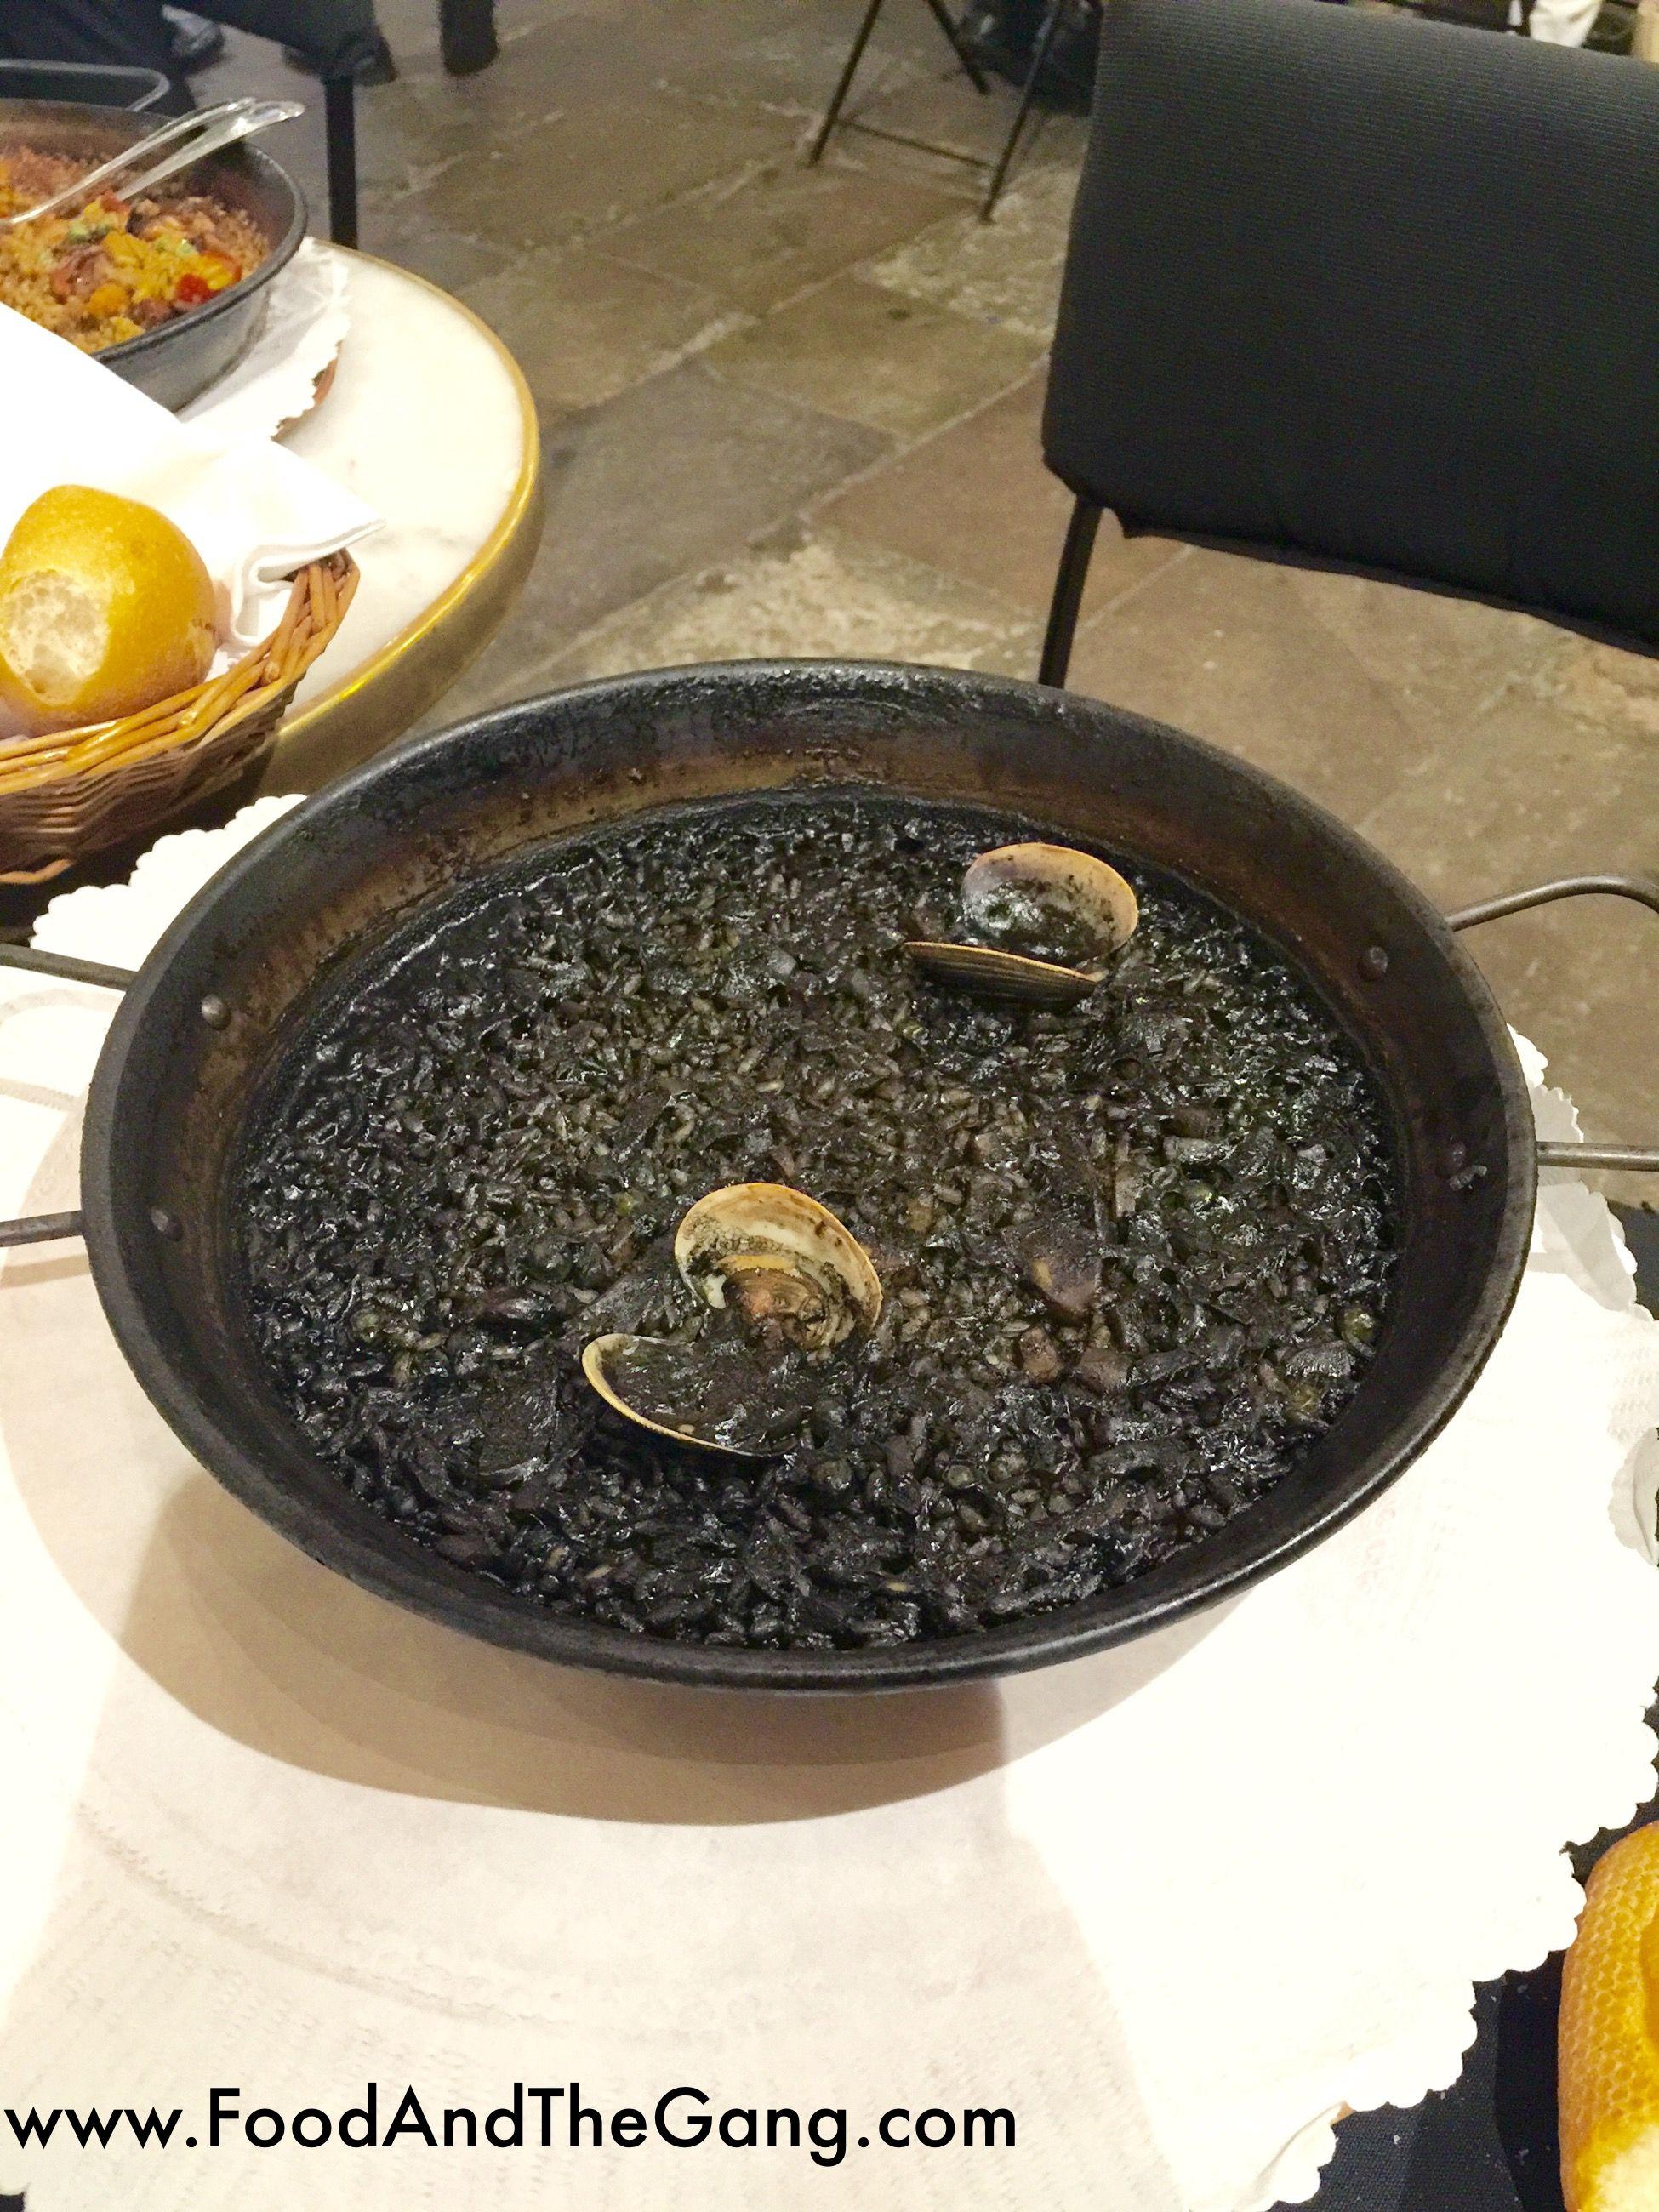 ** 7 PORTES - BARCELONA ** Paella Encre de Seiche / BEST PAELLA EVER!!! #SeaFood #FruitsDeMer #Paella #EatGirl #Barcelone #Bcn #Restaurant #EatGirl #FoodTrotter #FoodJungle #Foodreporter #SietePortes #PlaceToEat